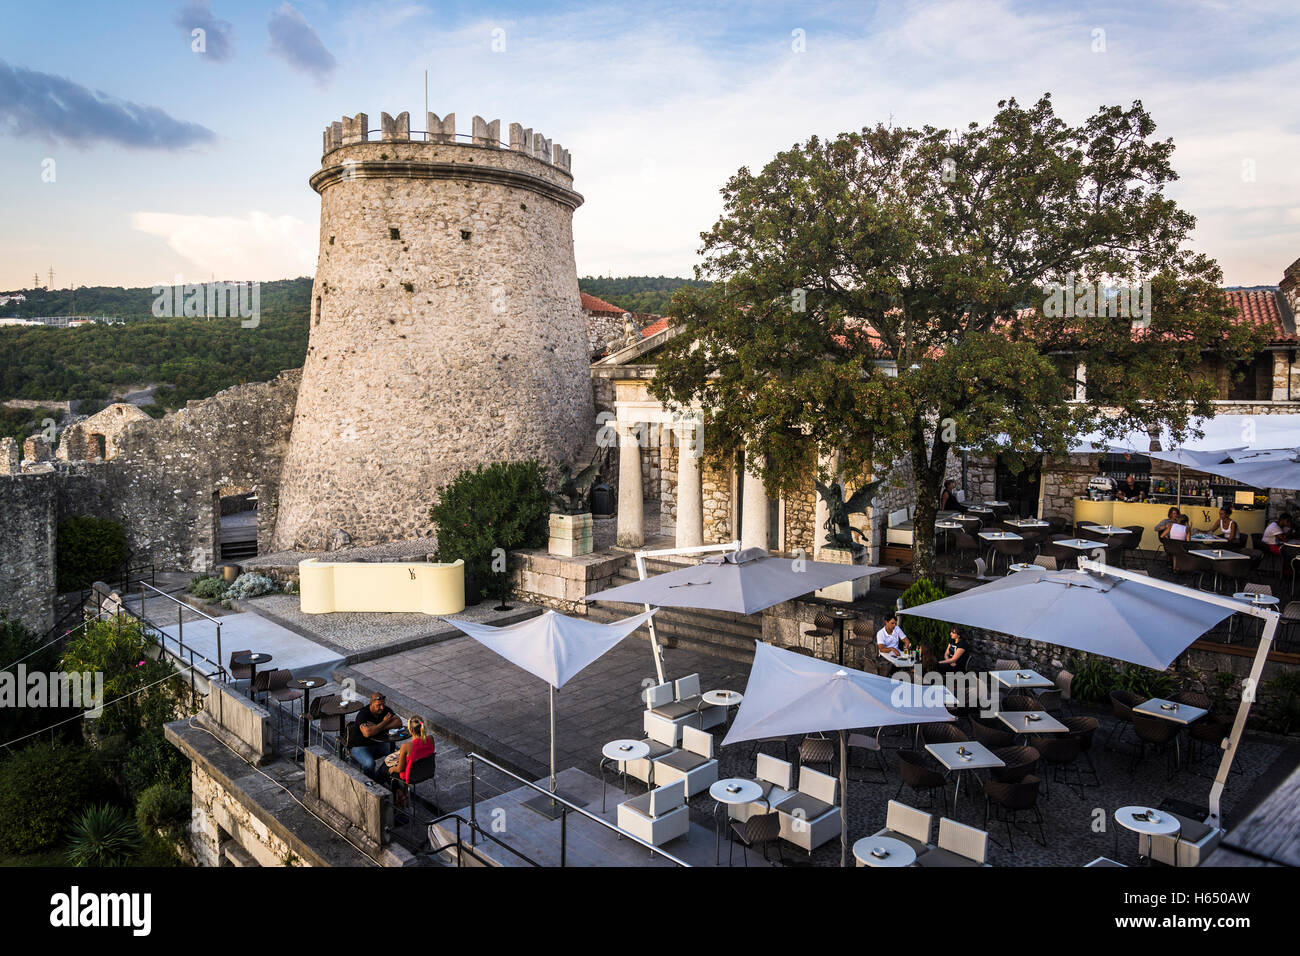 Trsat Castle, 13th century edifice, Rijeka, Croatia - Stock Image